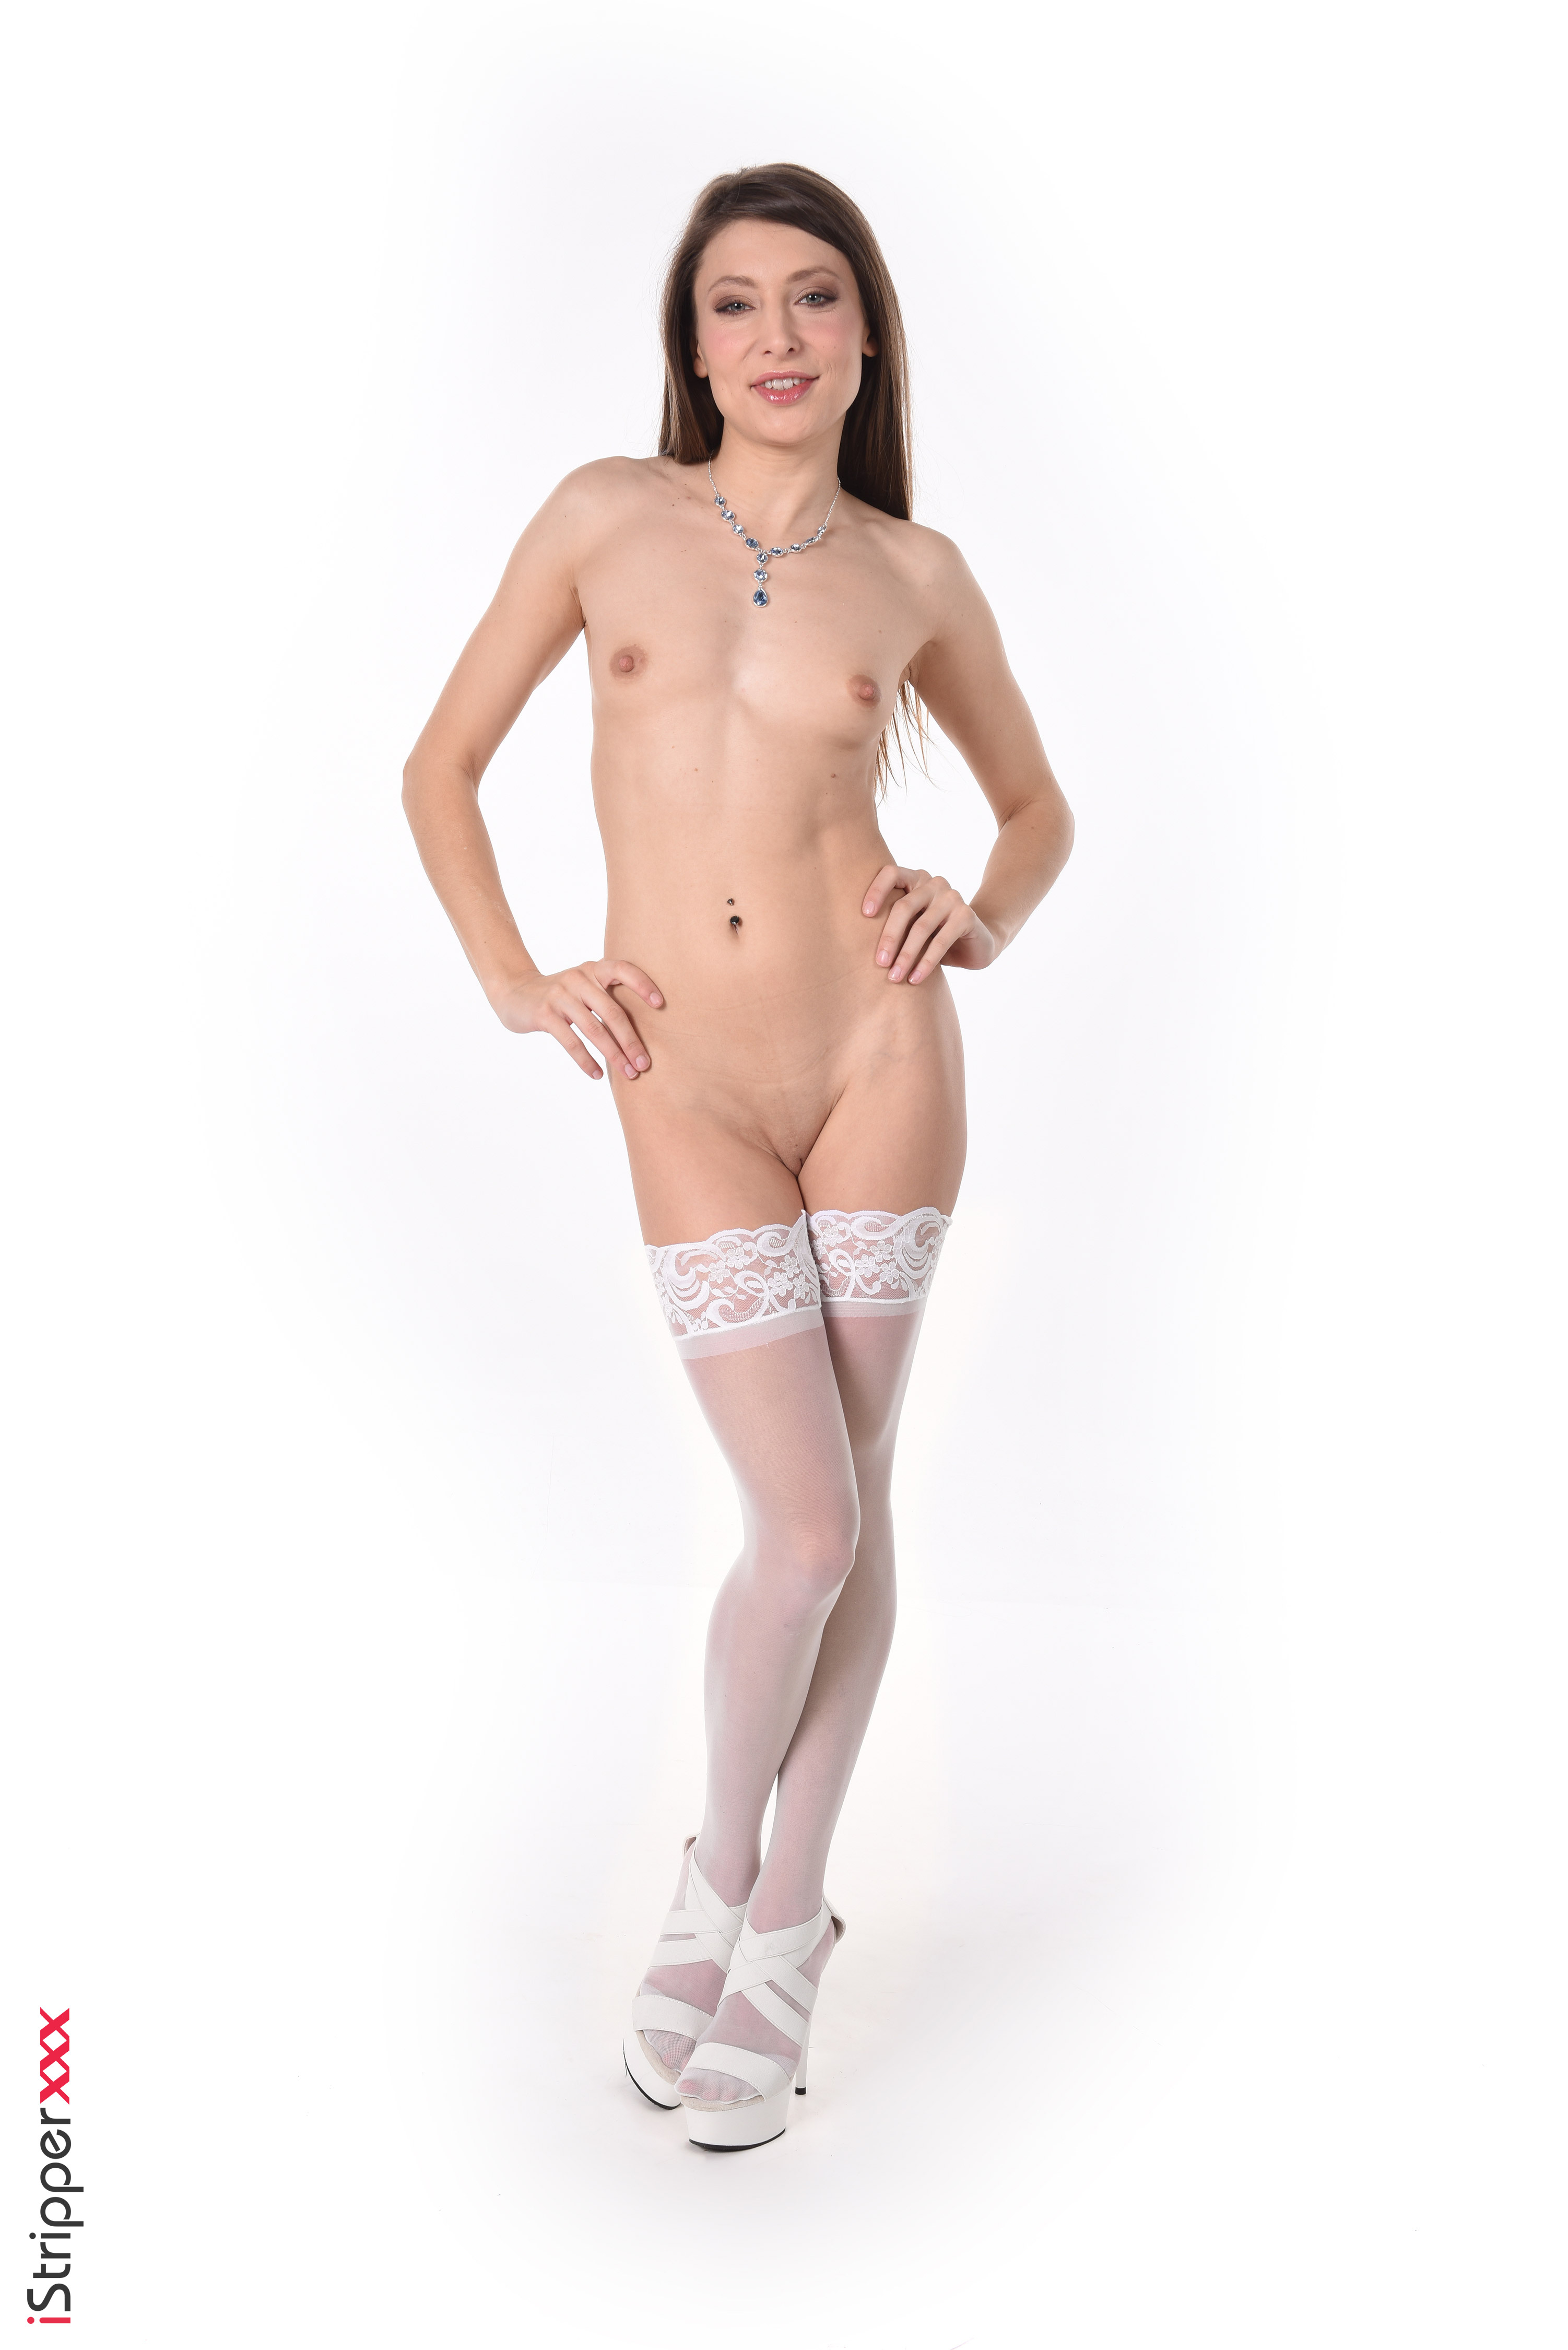 teen sexy nude wallpapers hd